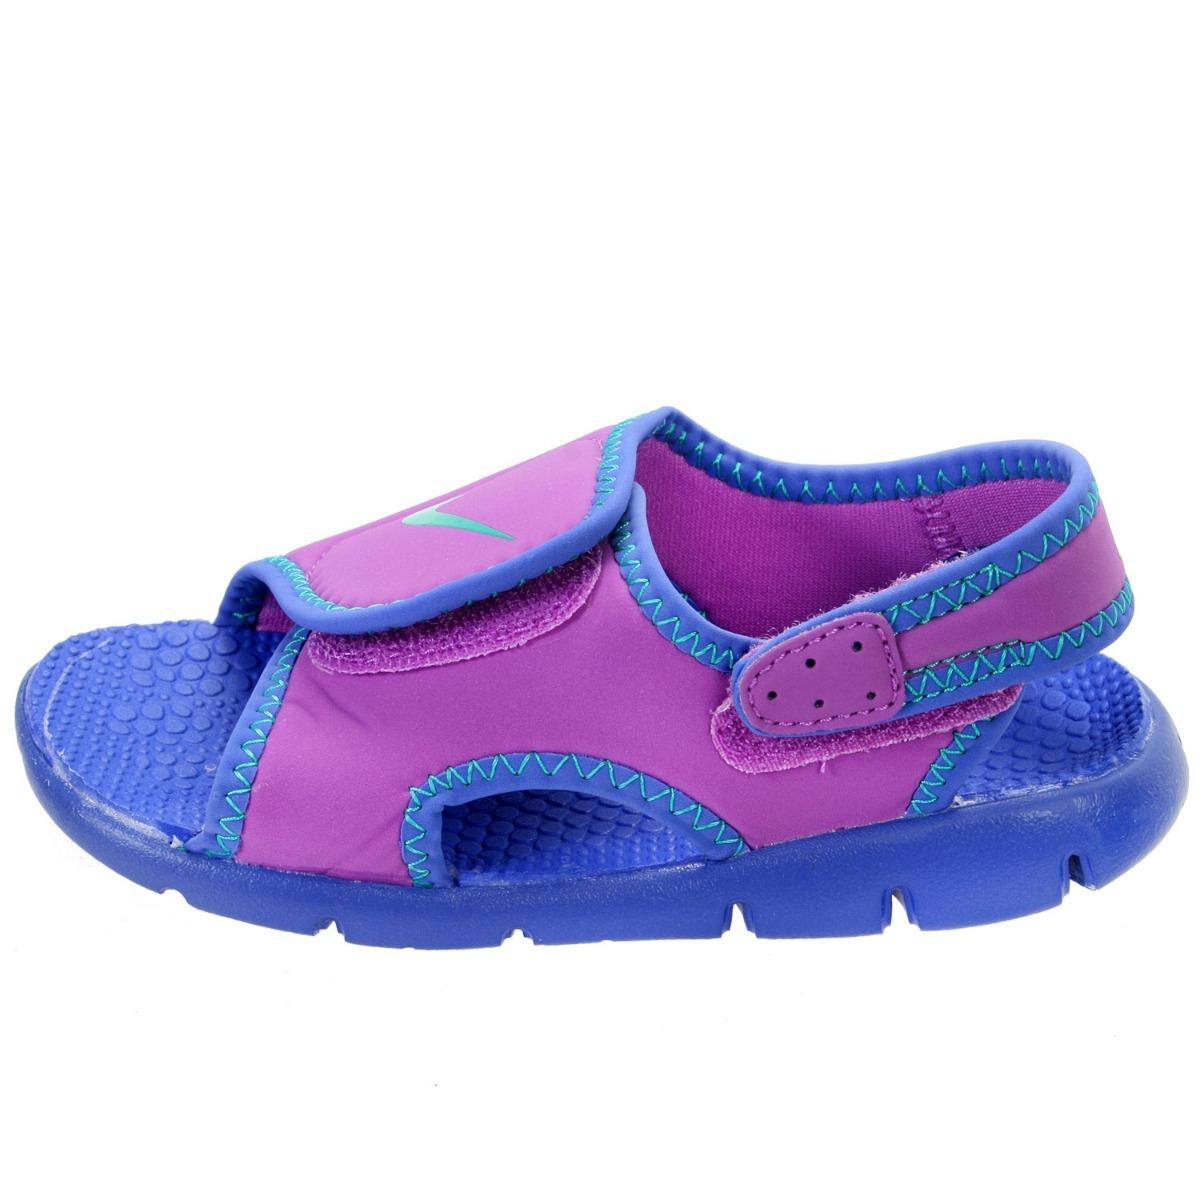 Sandalias Nike Adjust Niñas - New